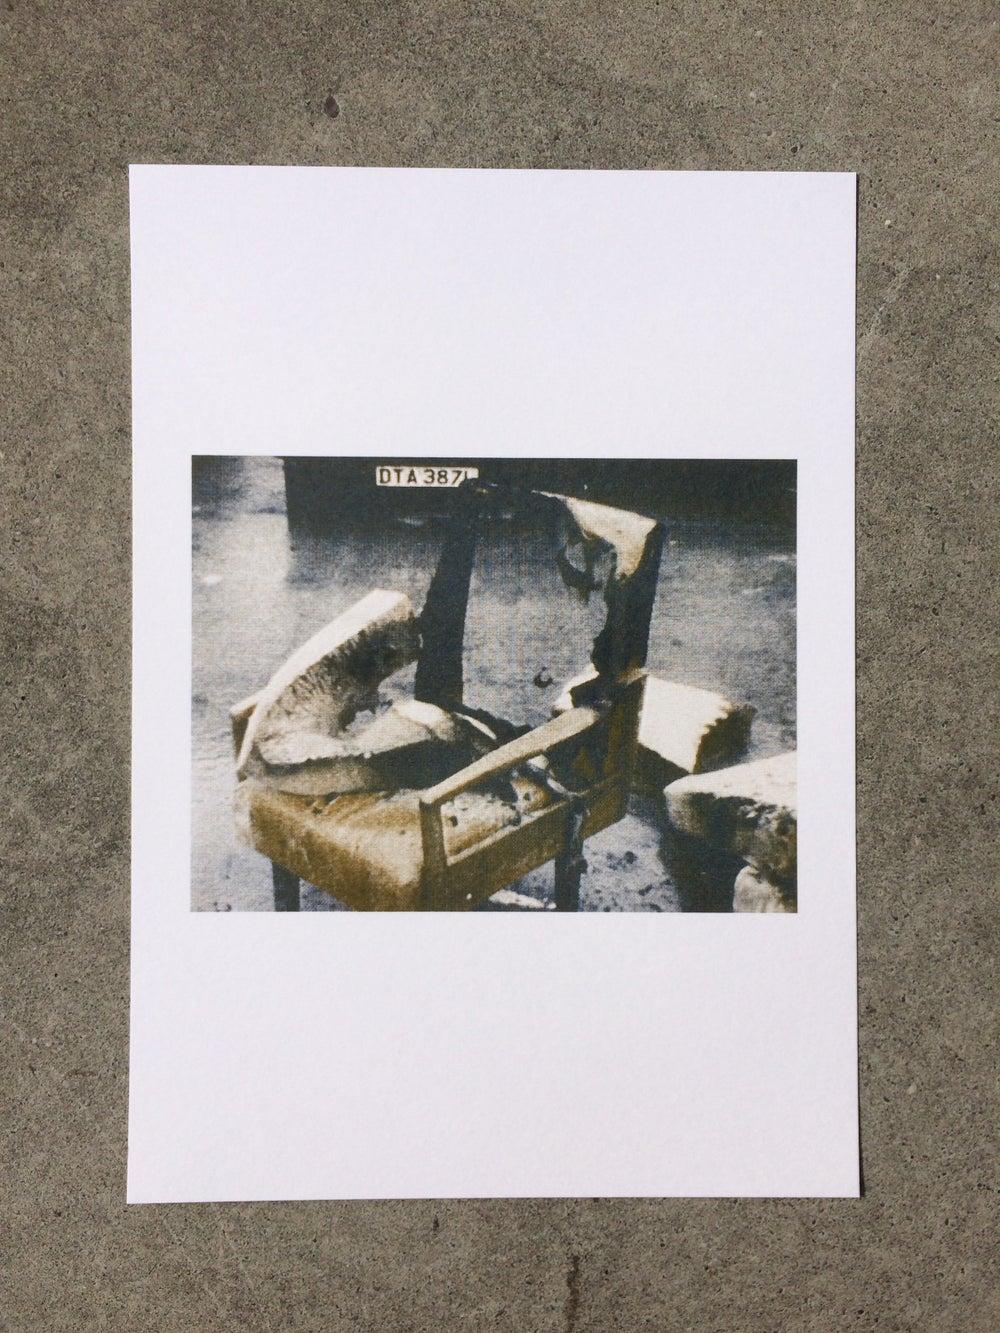 Image of Frances Scott, 'House Work' Edition